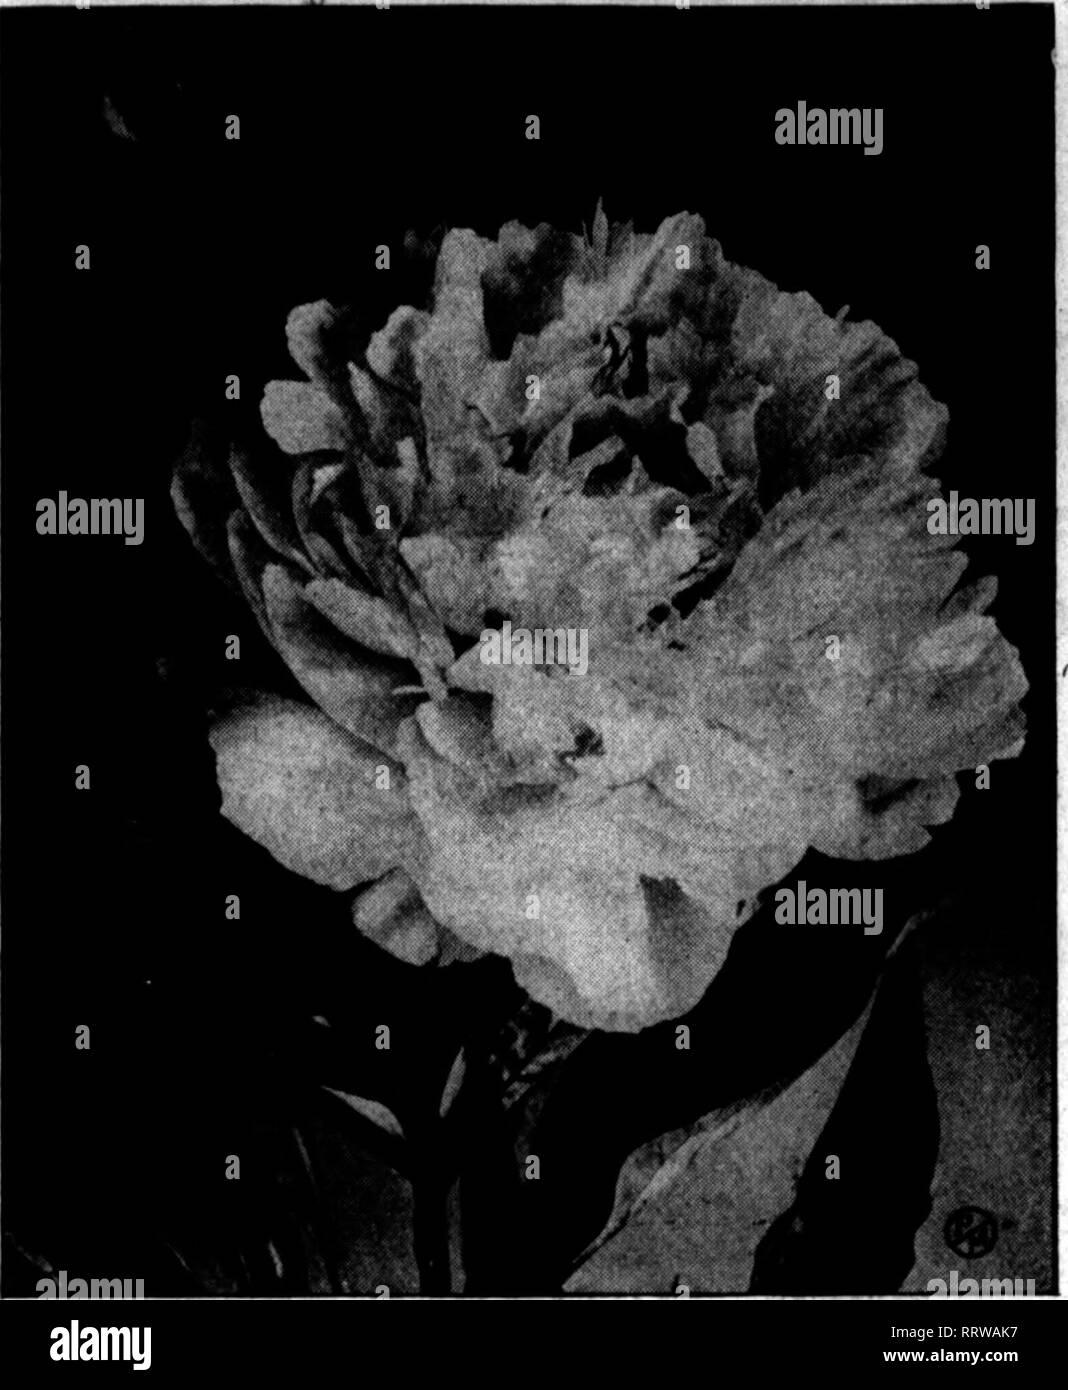 Florists' review [microform]  Floriculture  i(f^pBi vwT- ,«T